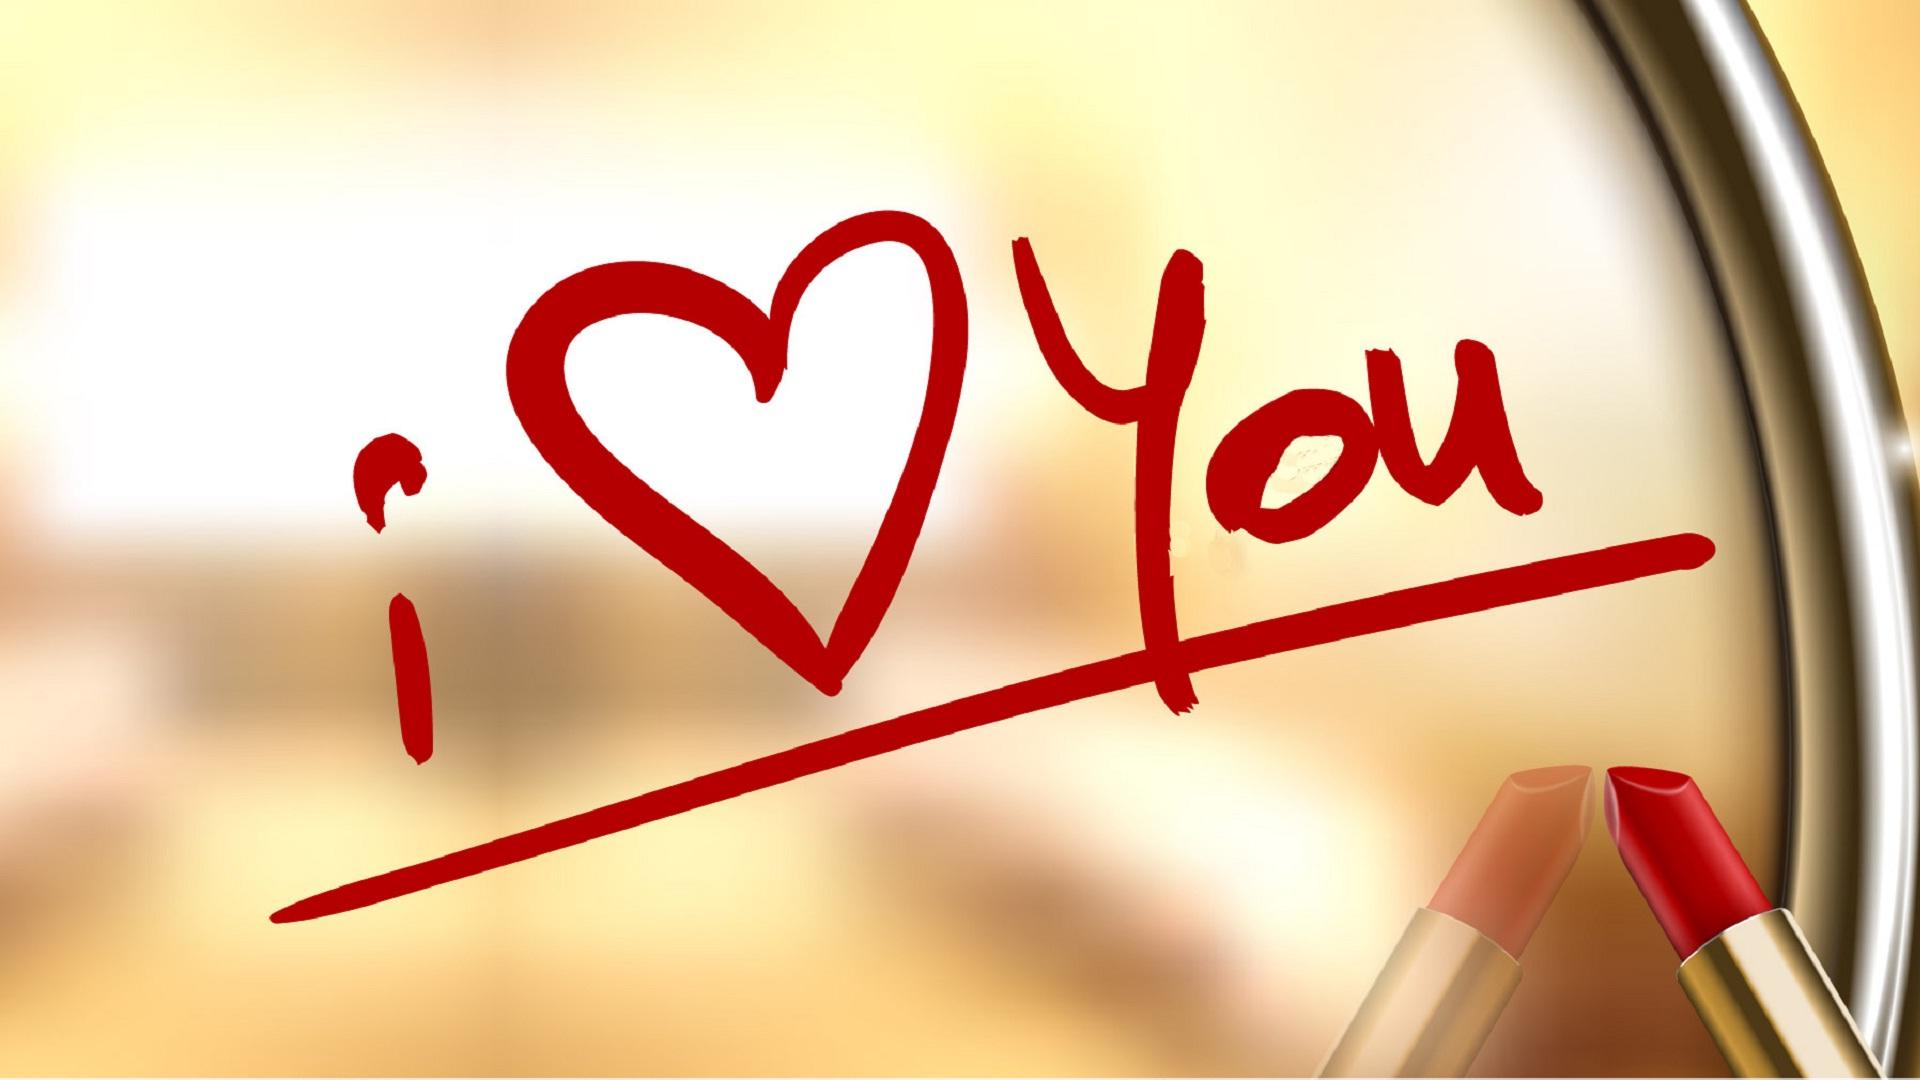 Free Download Love New Hd Wallpaper Hd Wallpapers Rocks 1920x1080